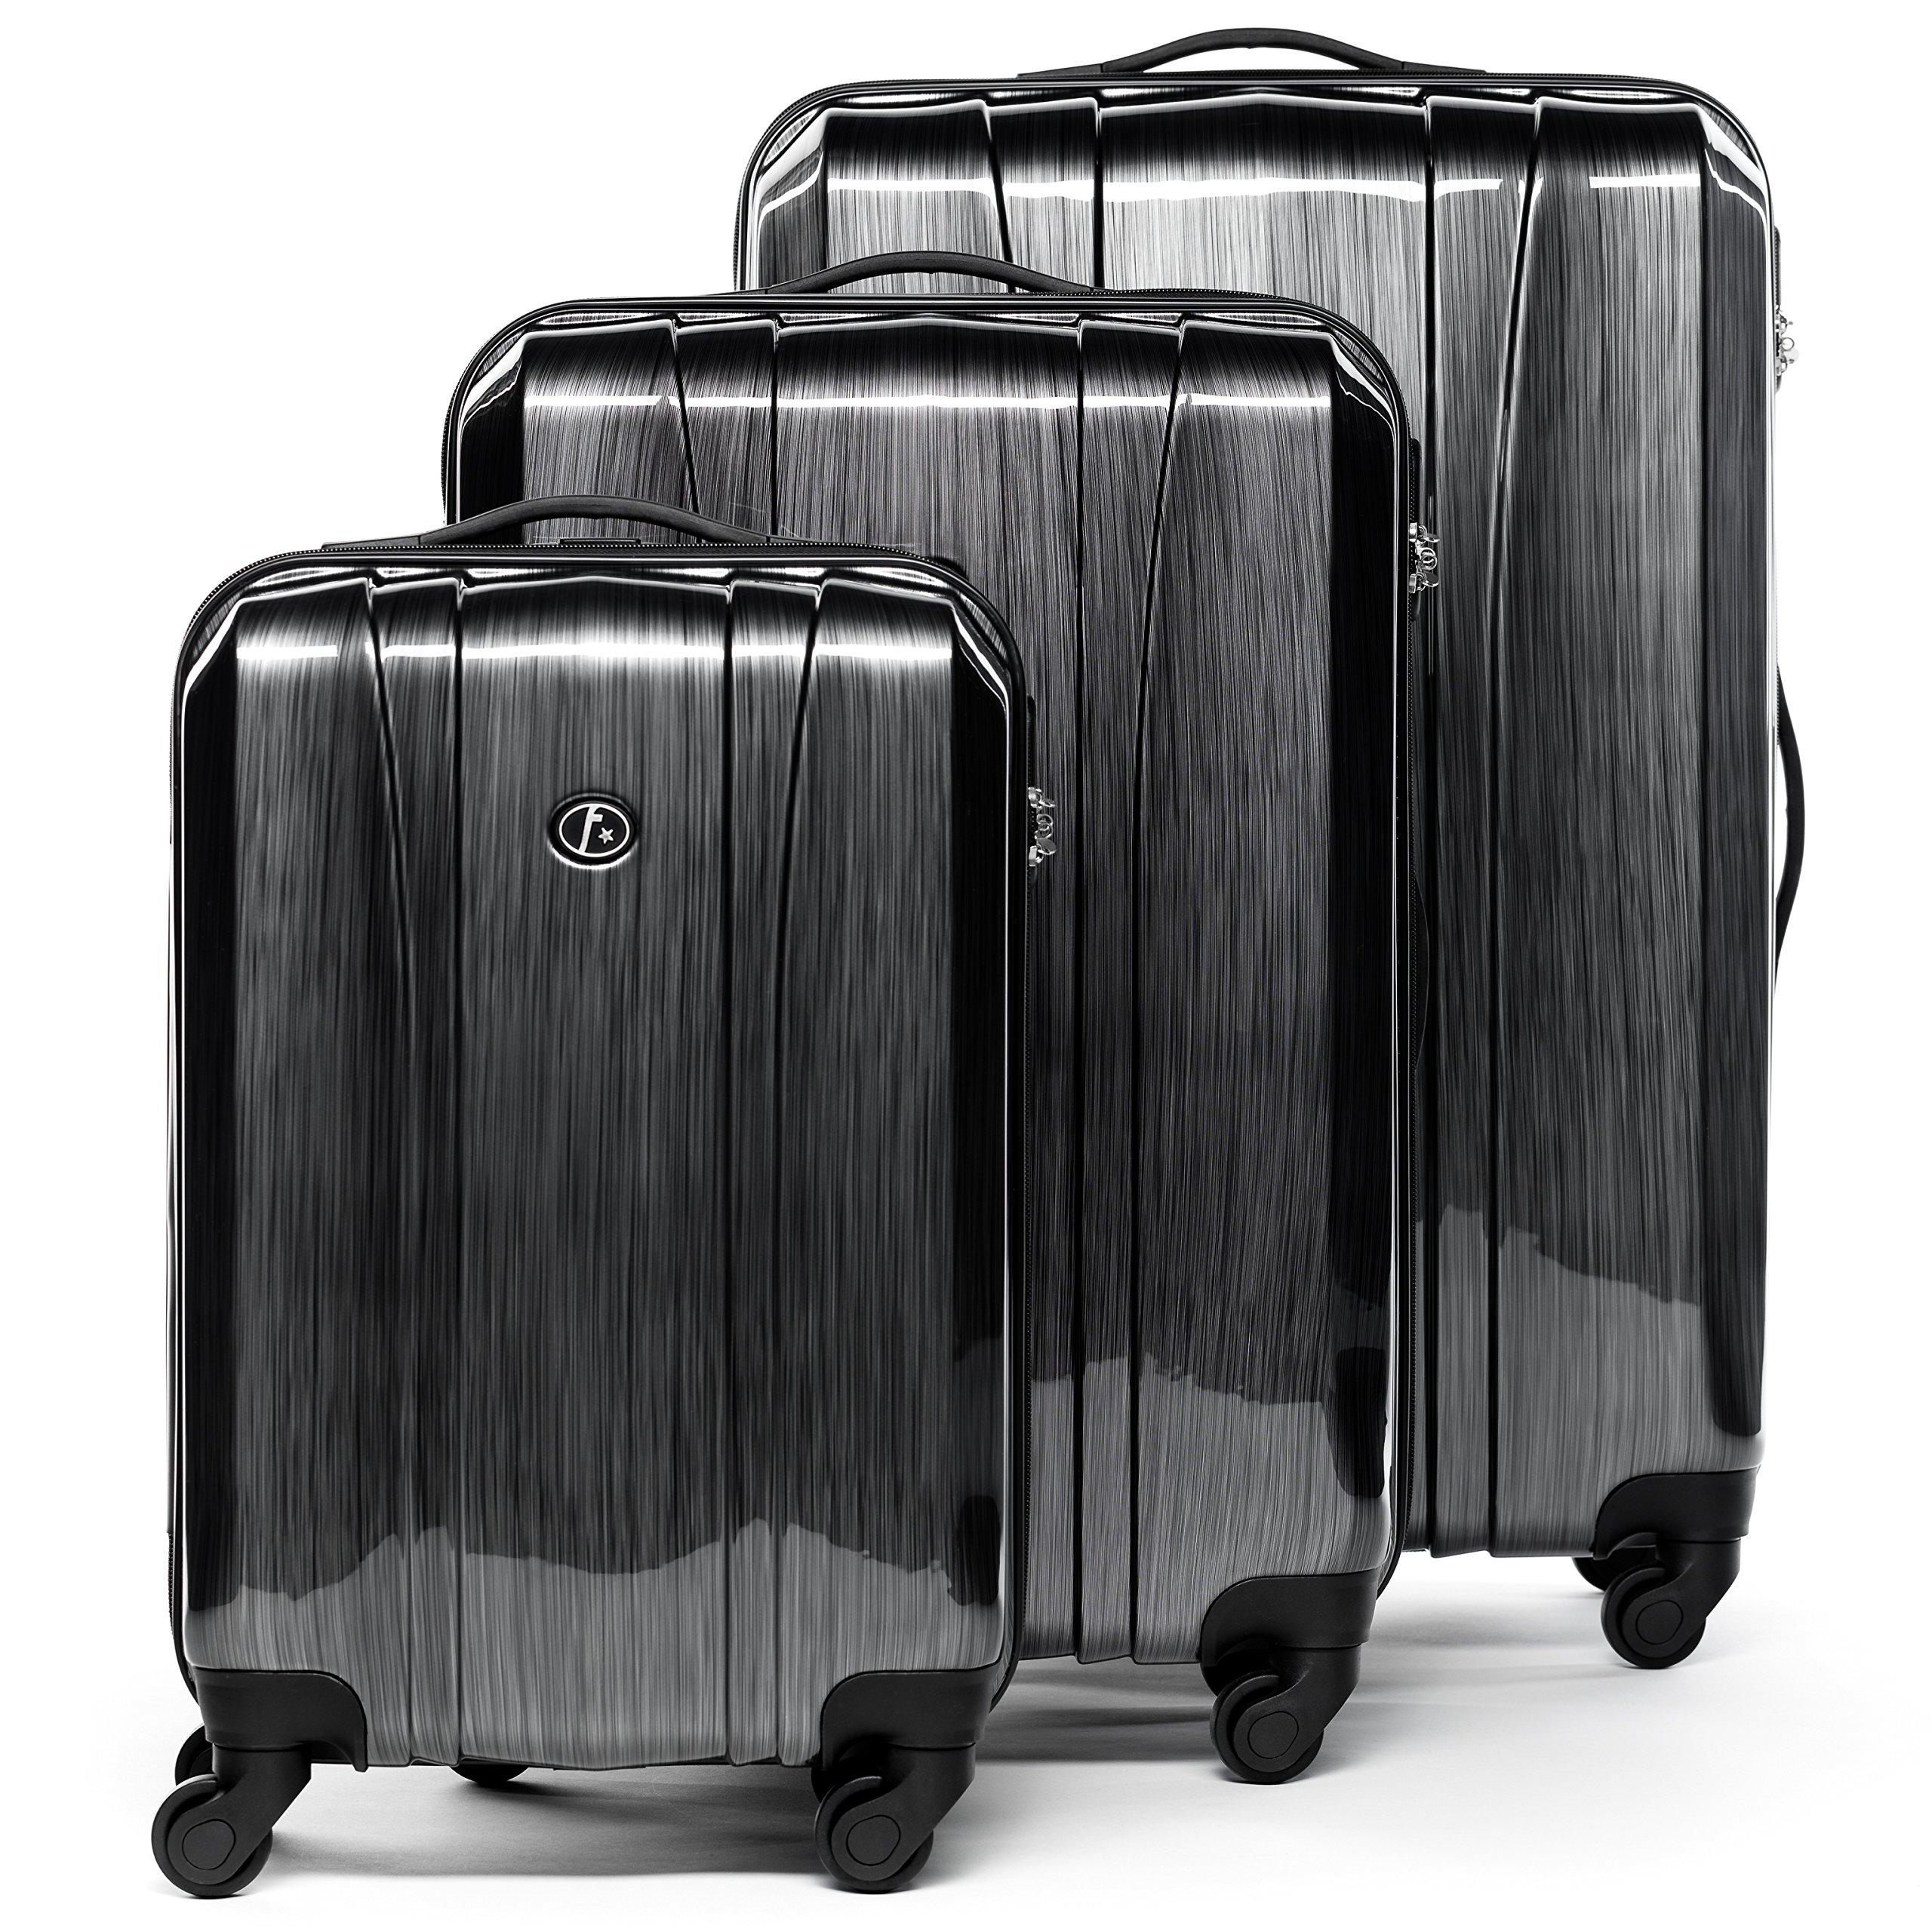 ferg koffer koffersets in vielen farben und gr en dijon. Black Bedroom Furniture Sets. Home Design Ideas